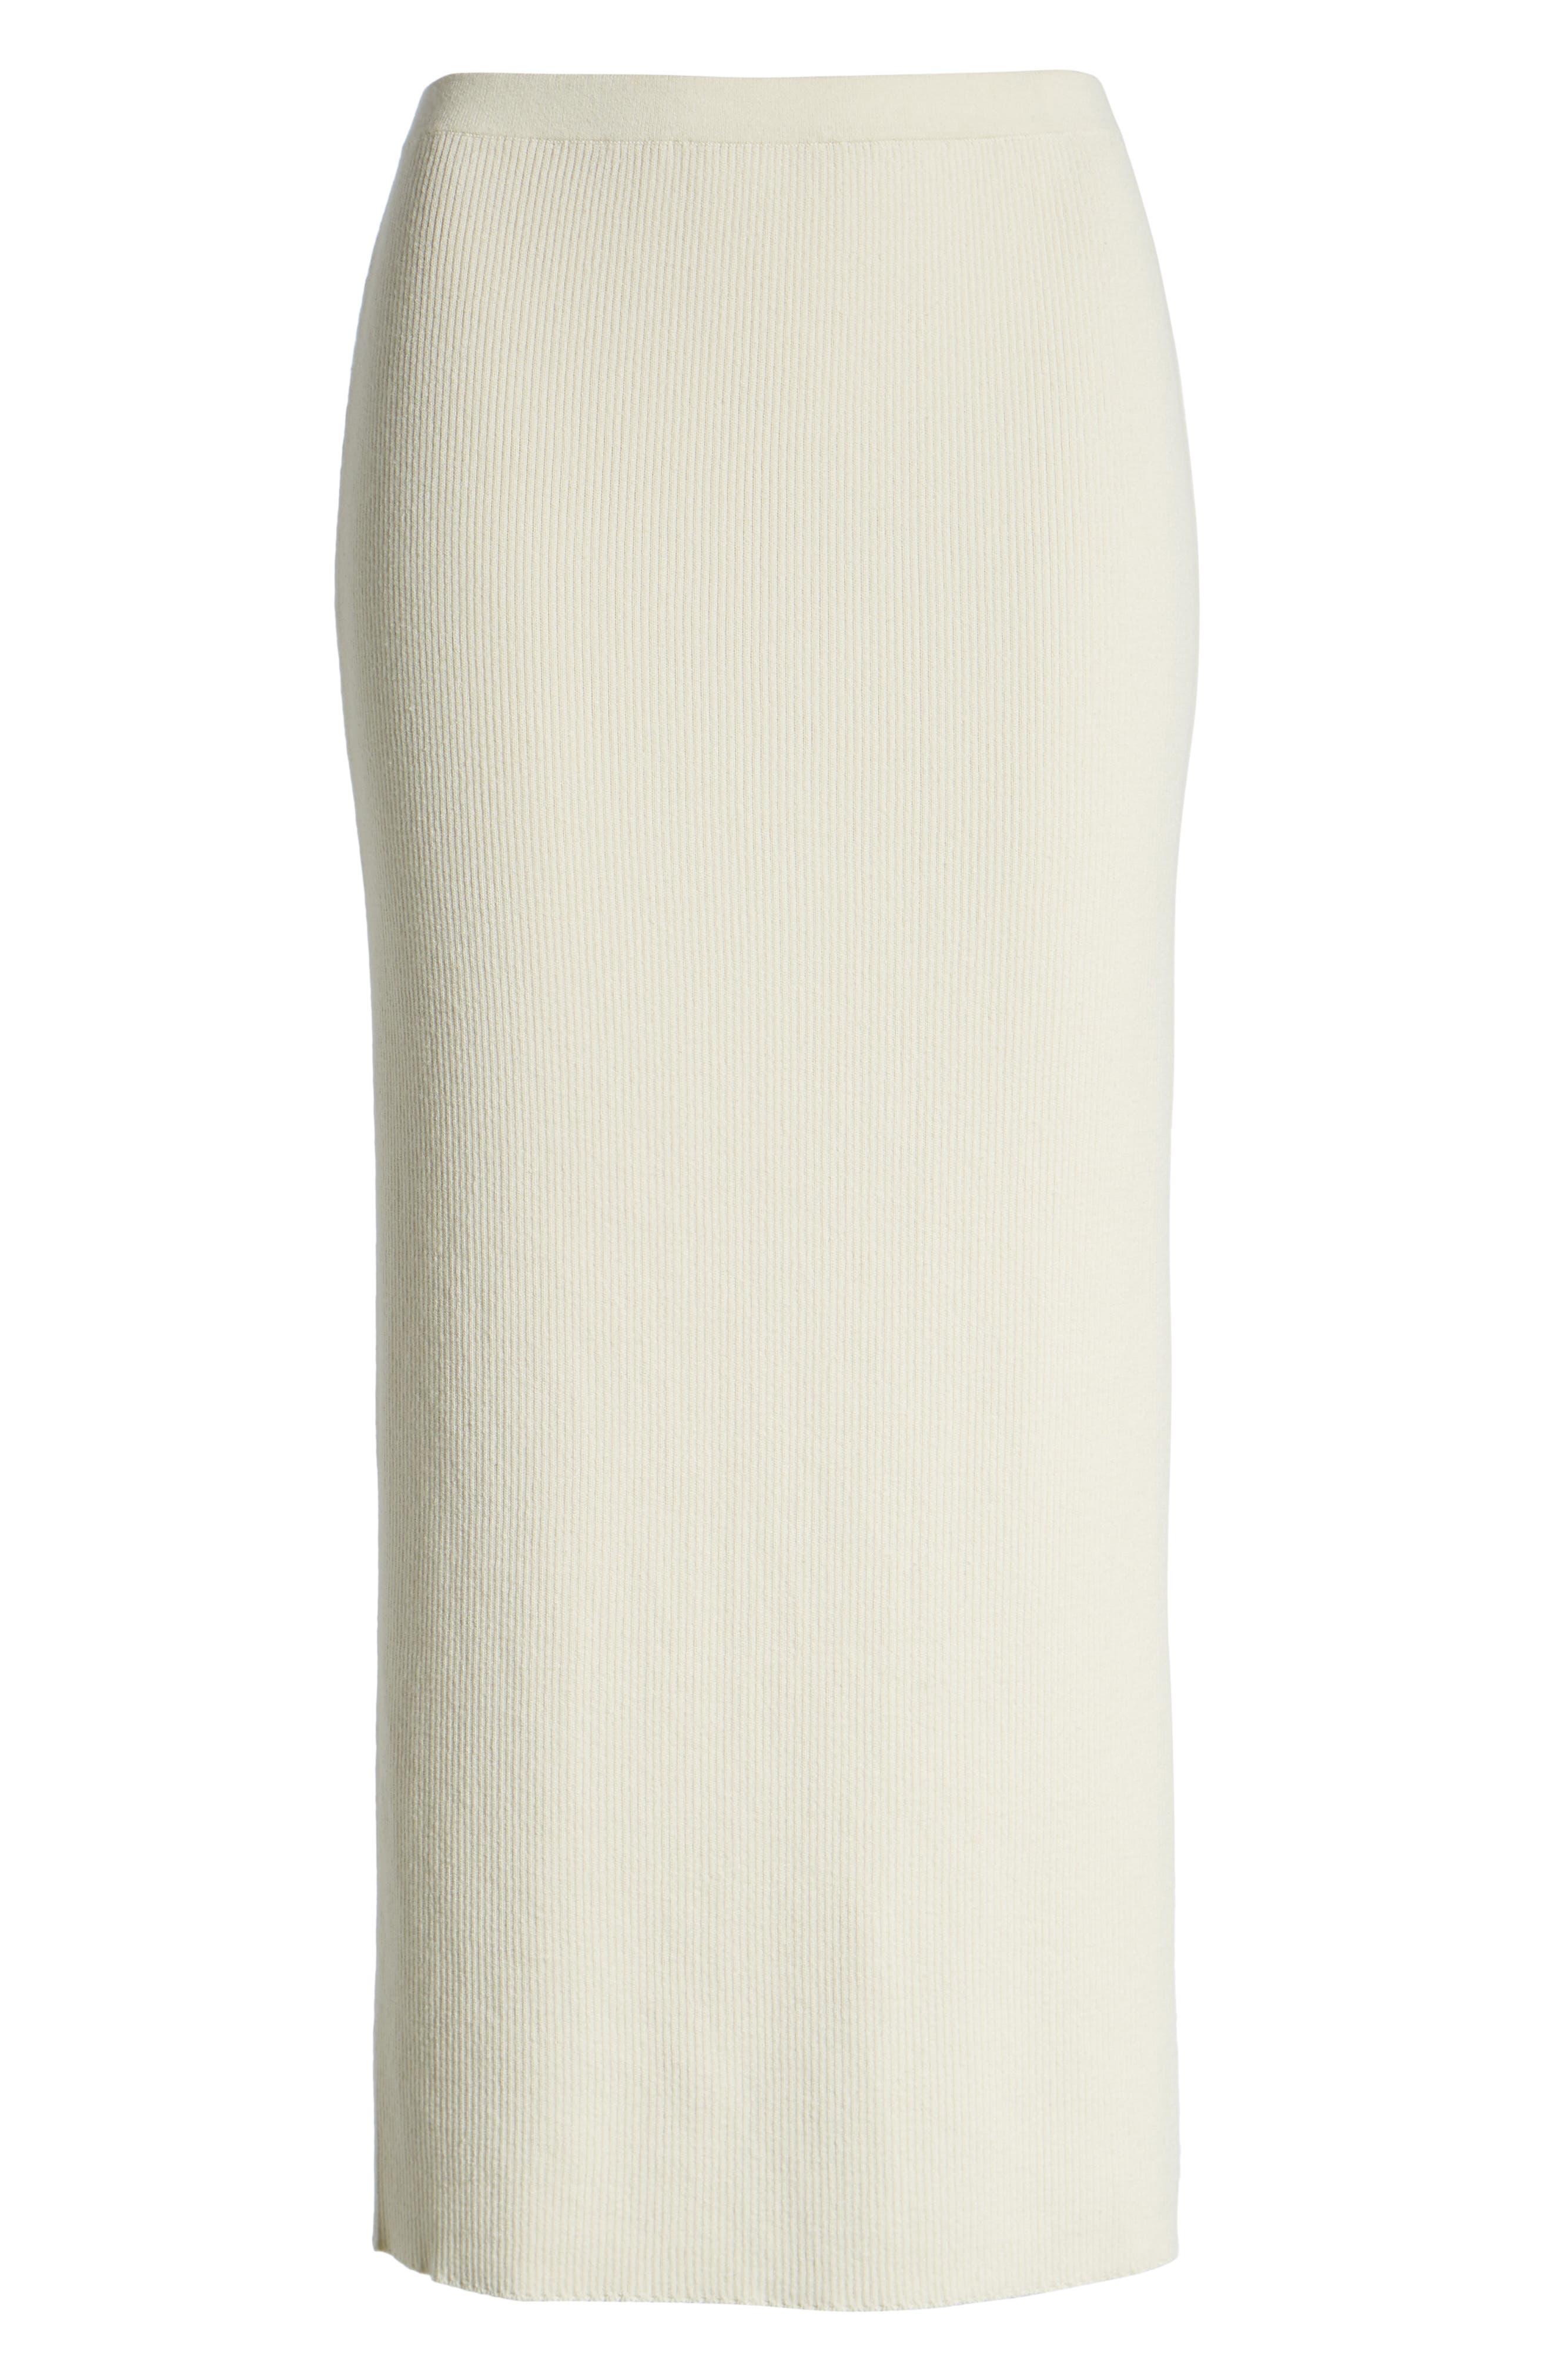 SOMETHING NAVY, Rib Sweater Midi Skirt, Alternate thumbnail 7, color, 900